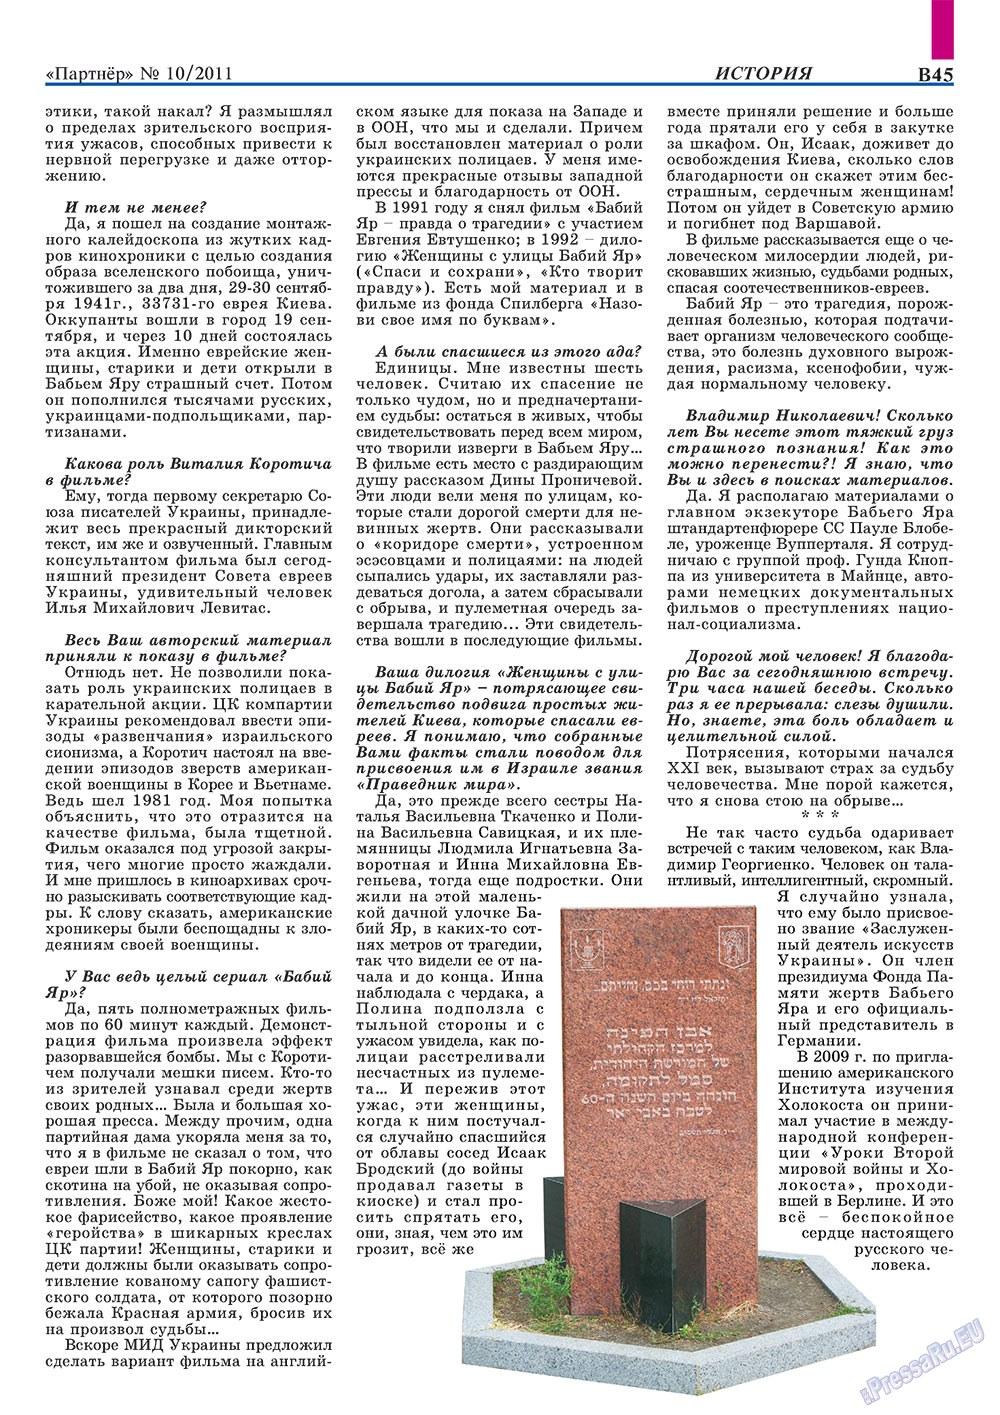 Партнер-север (журнал). 2011 год, номер 10, стр. 55